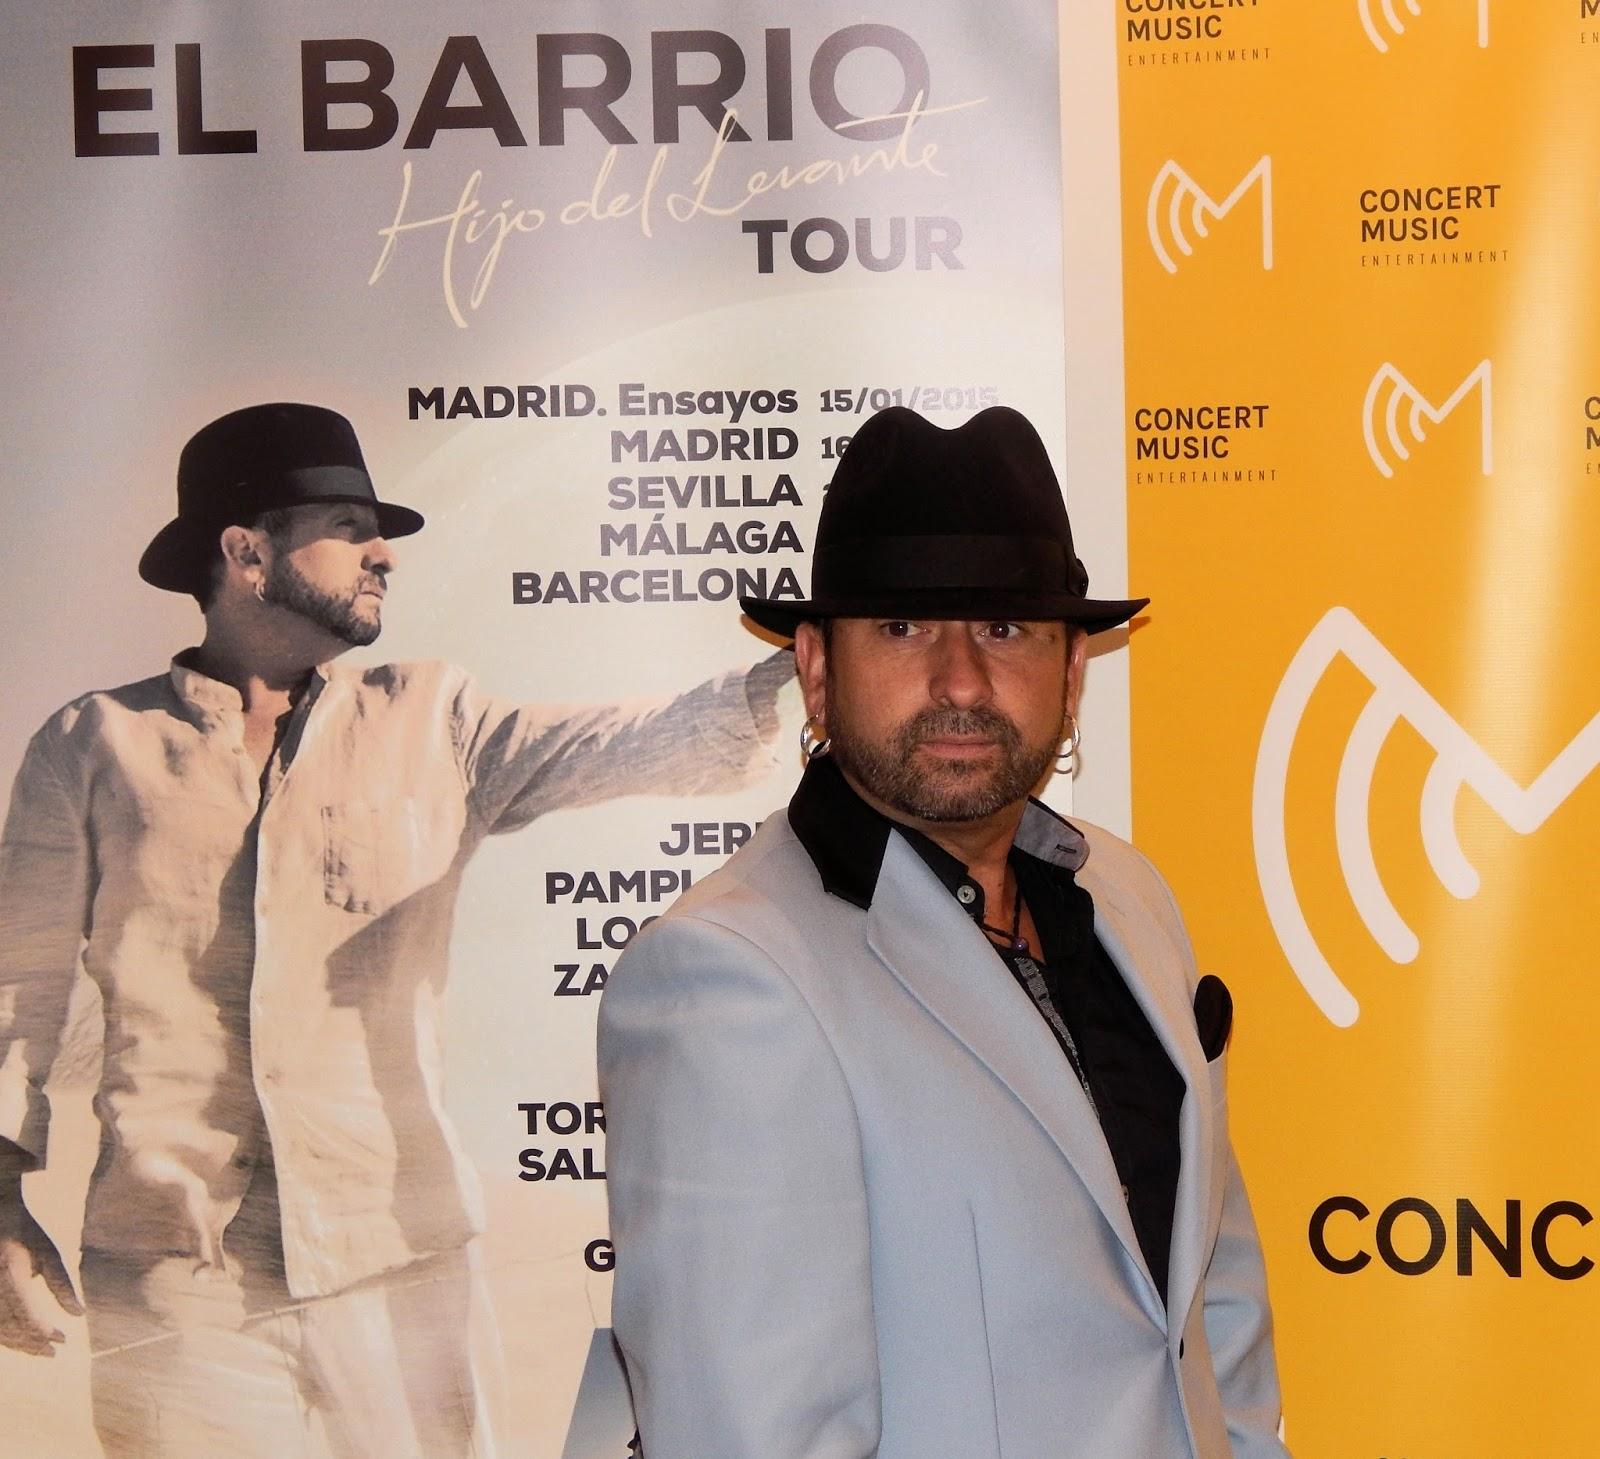 gira-2014-barrio-concierto-madrid-hijo-levante-